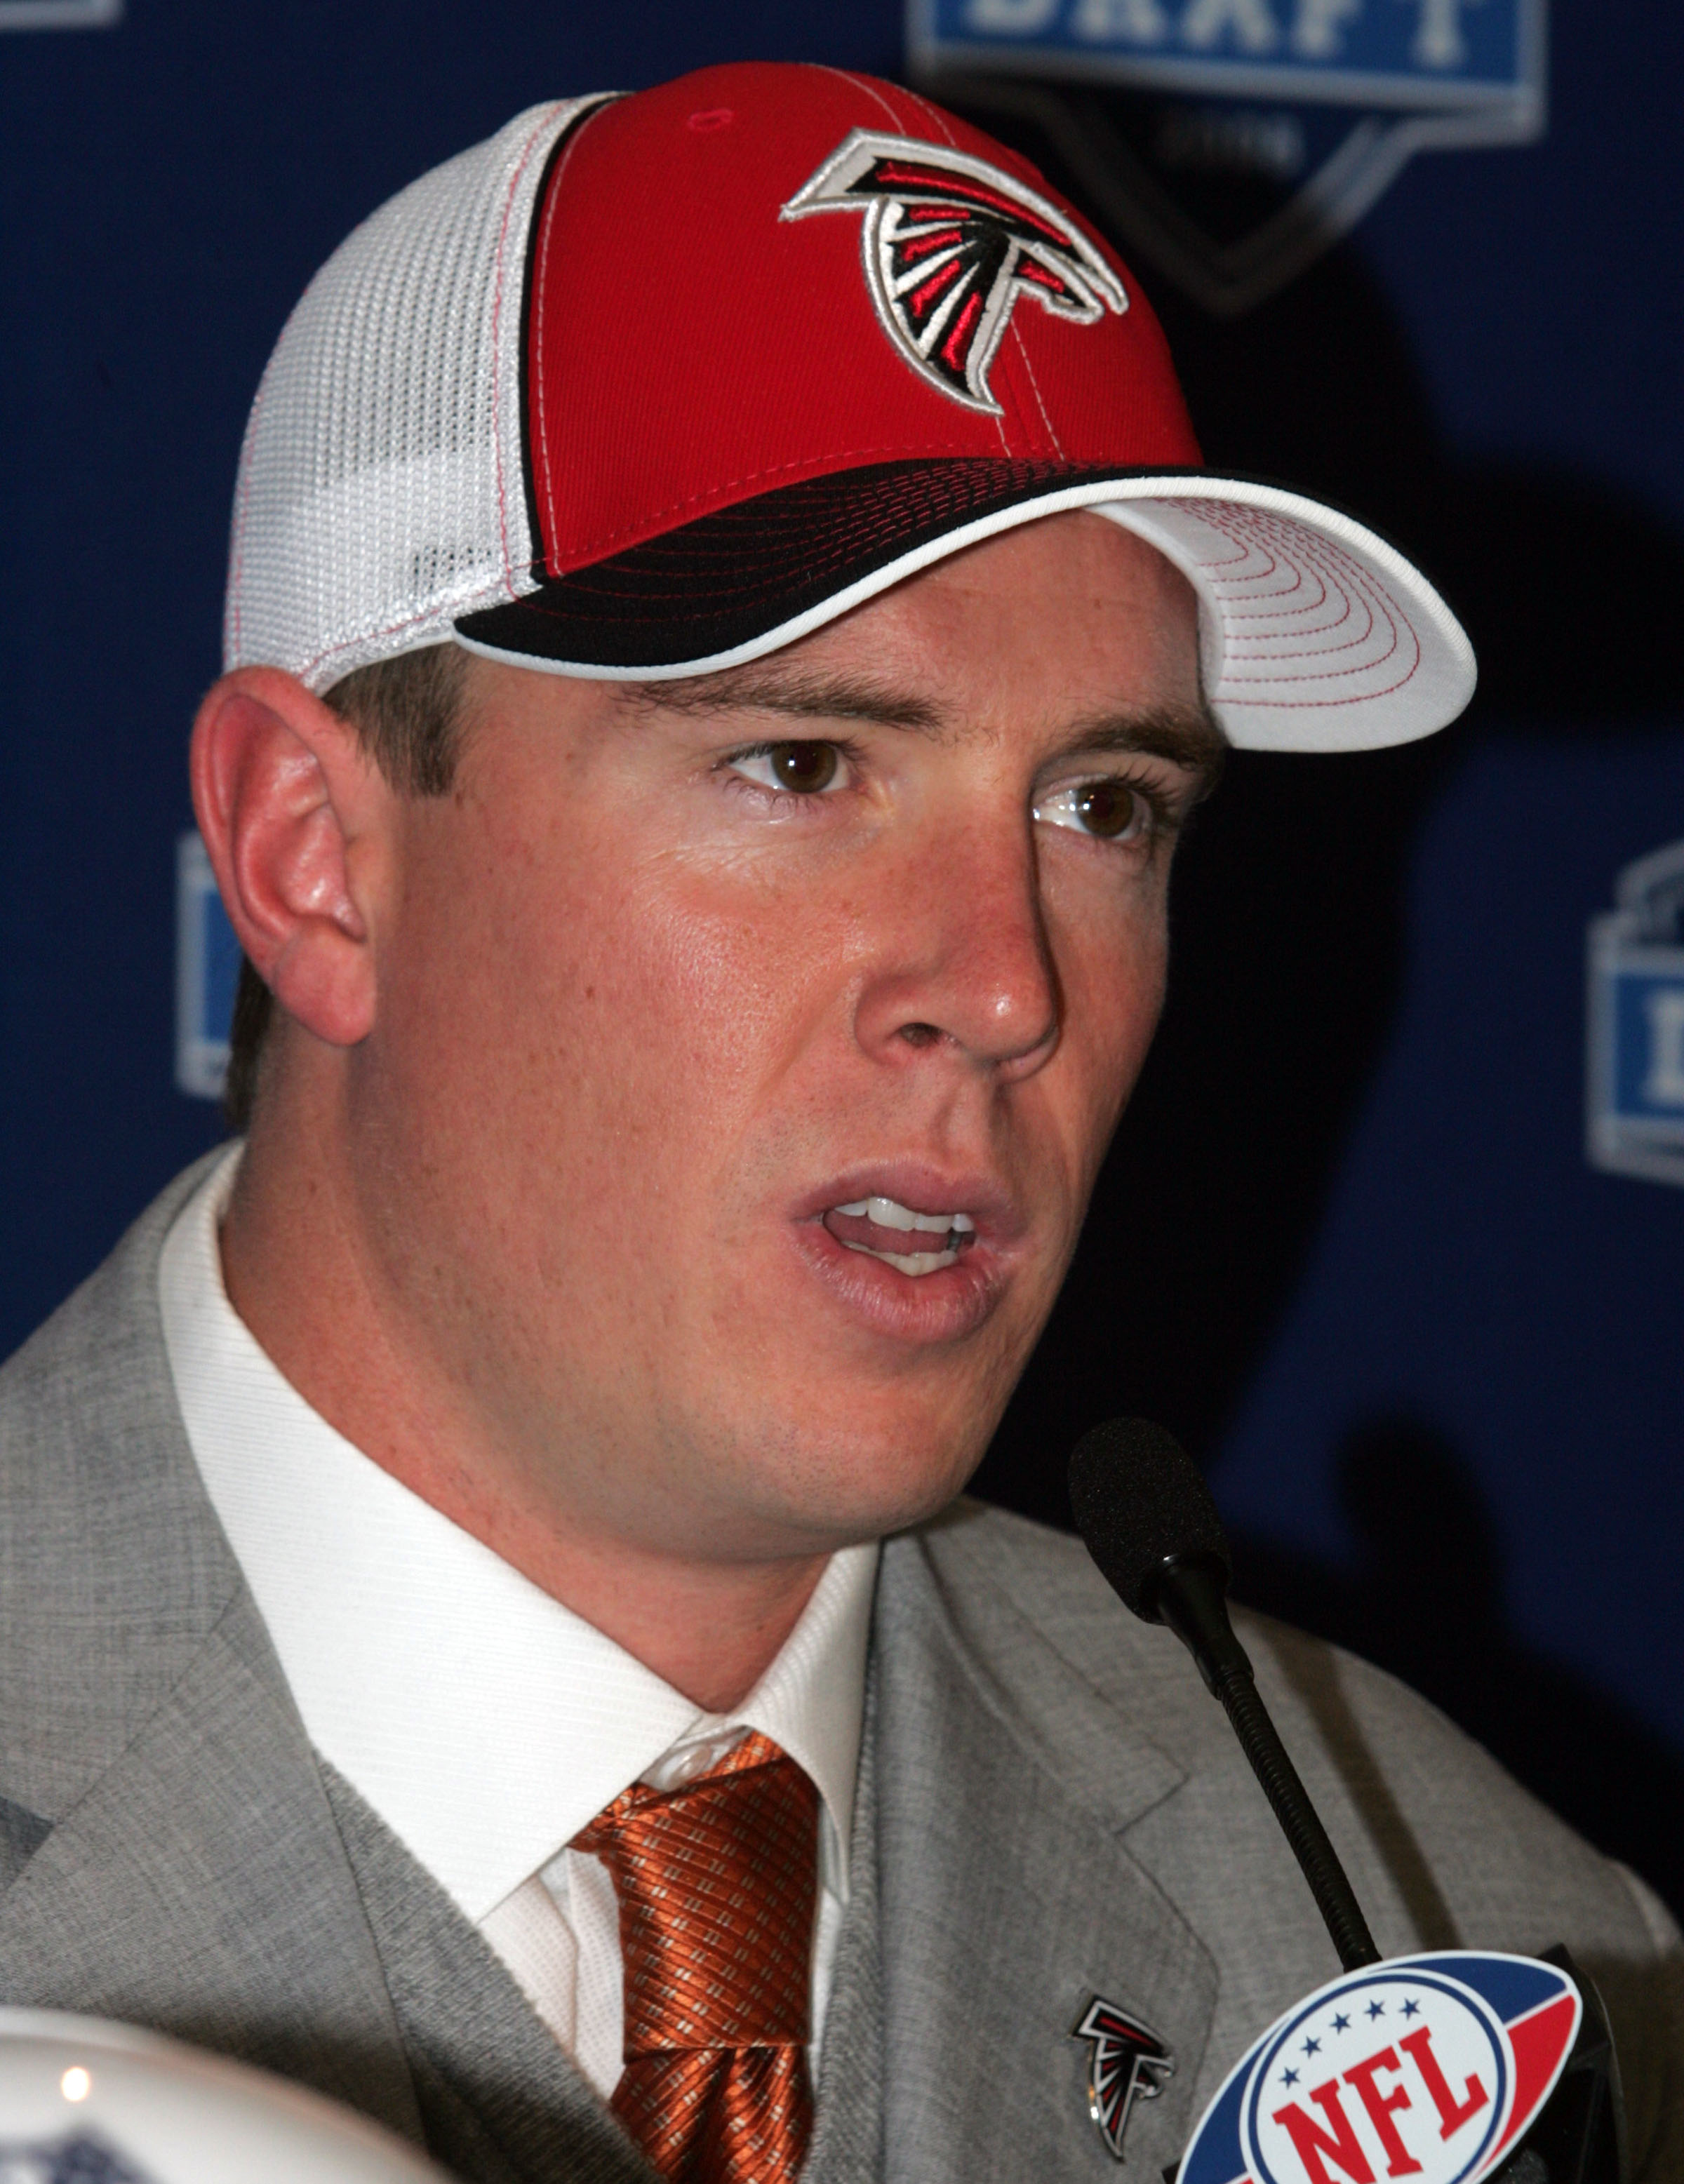 Football - NFL Draft 2008